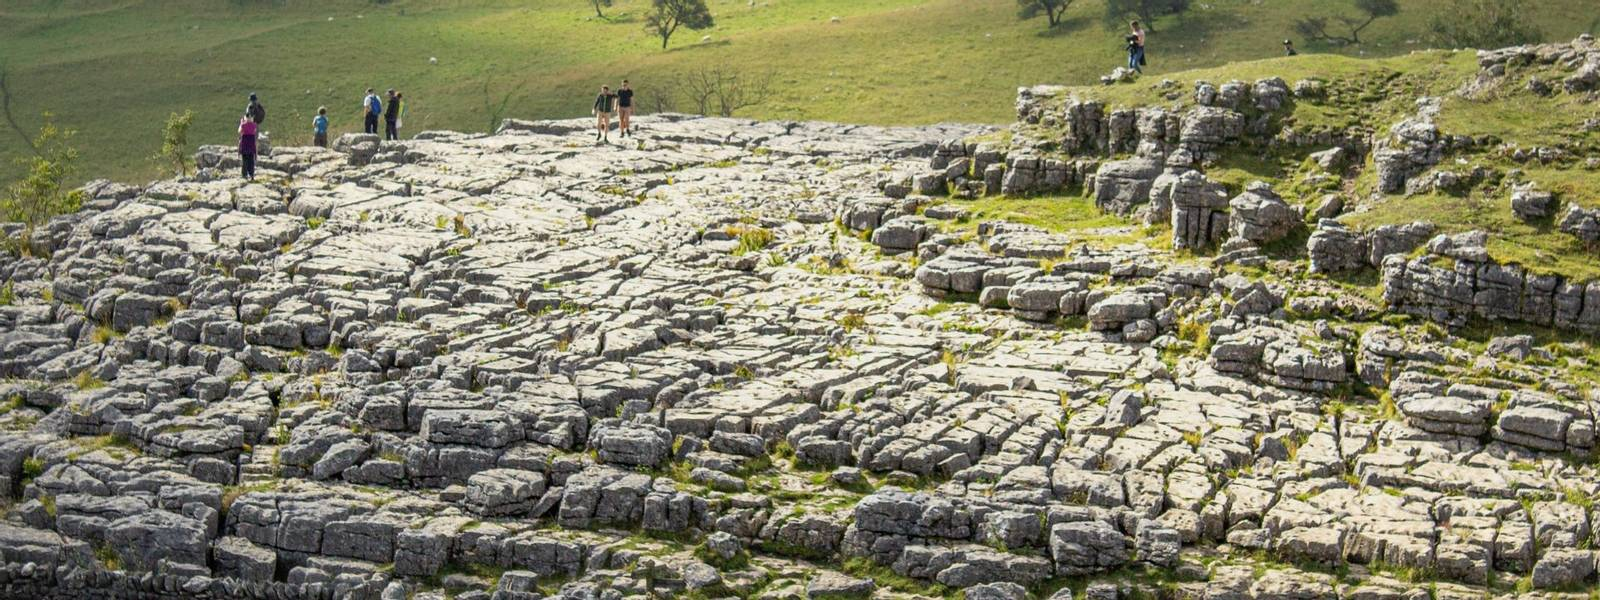 South_Yorkshire_Dales_Limestone_Pavement_Malham_Cove_AdobeStock_292693353.jpeg